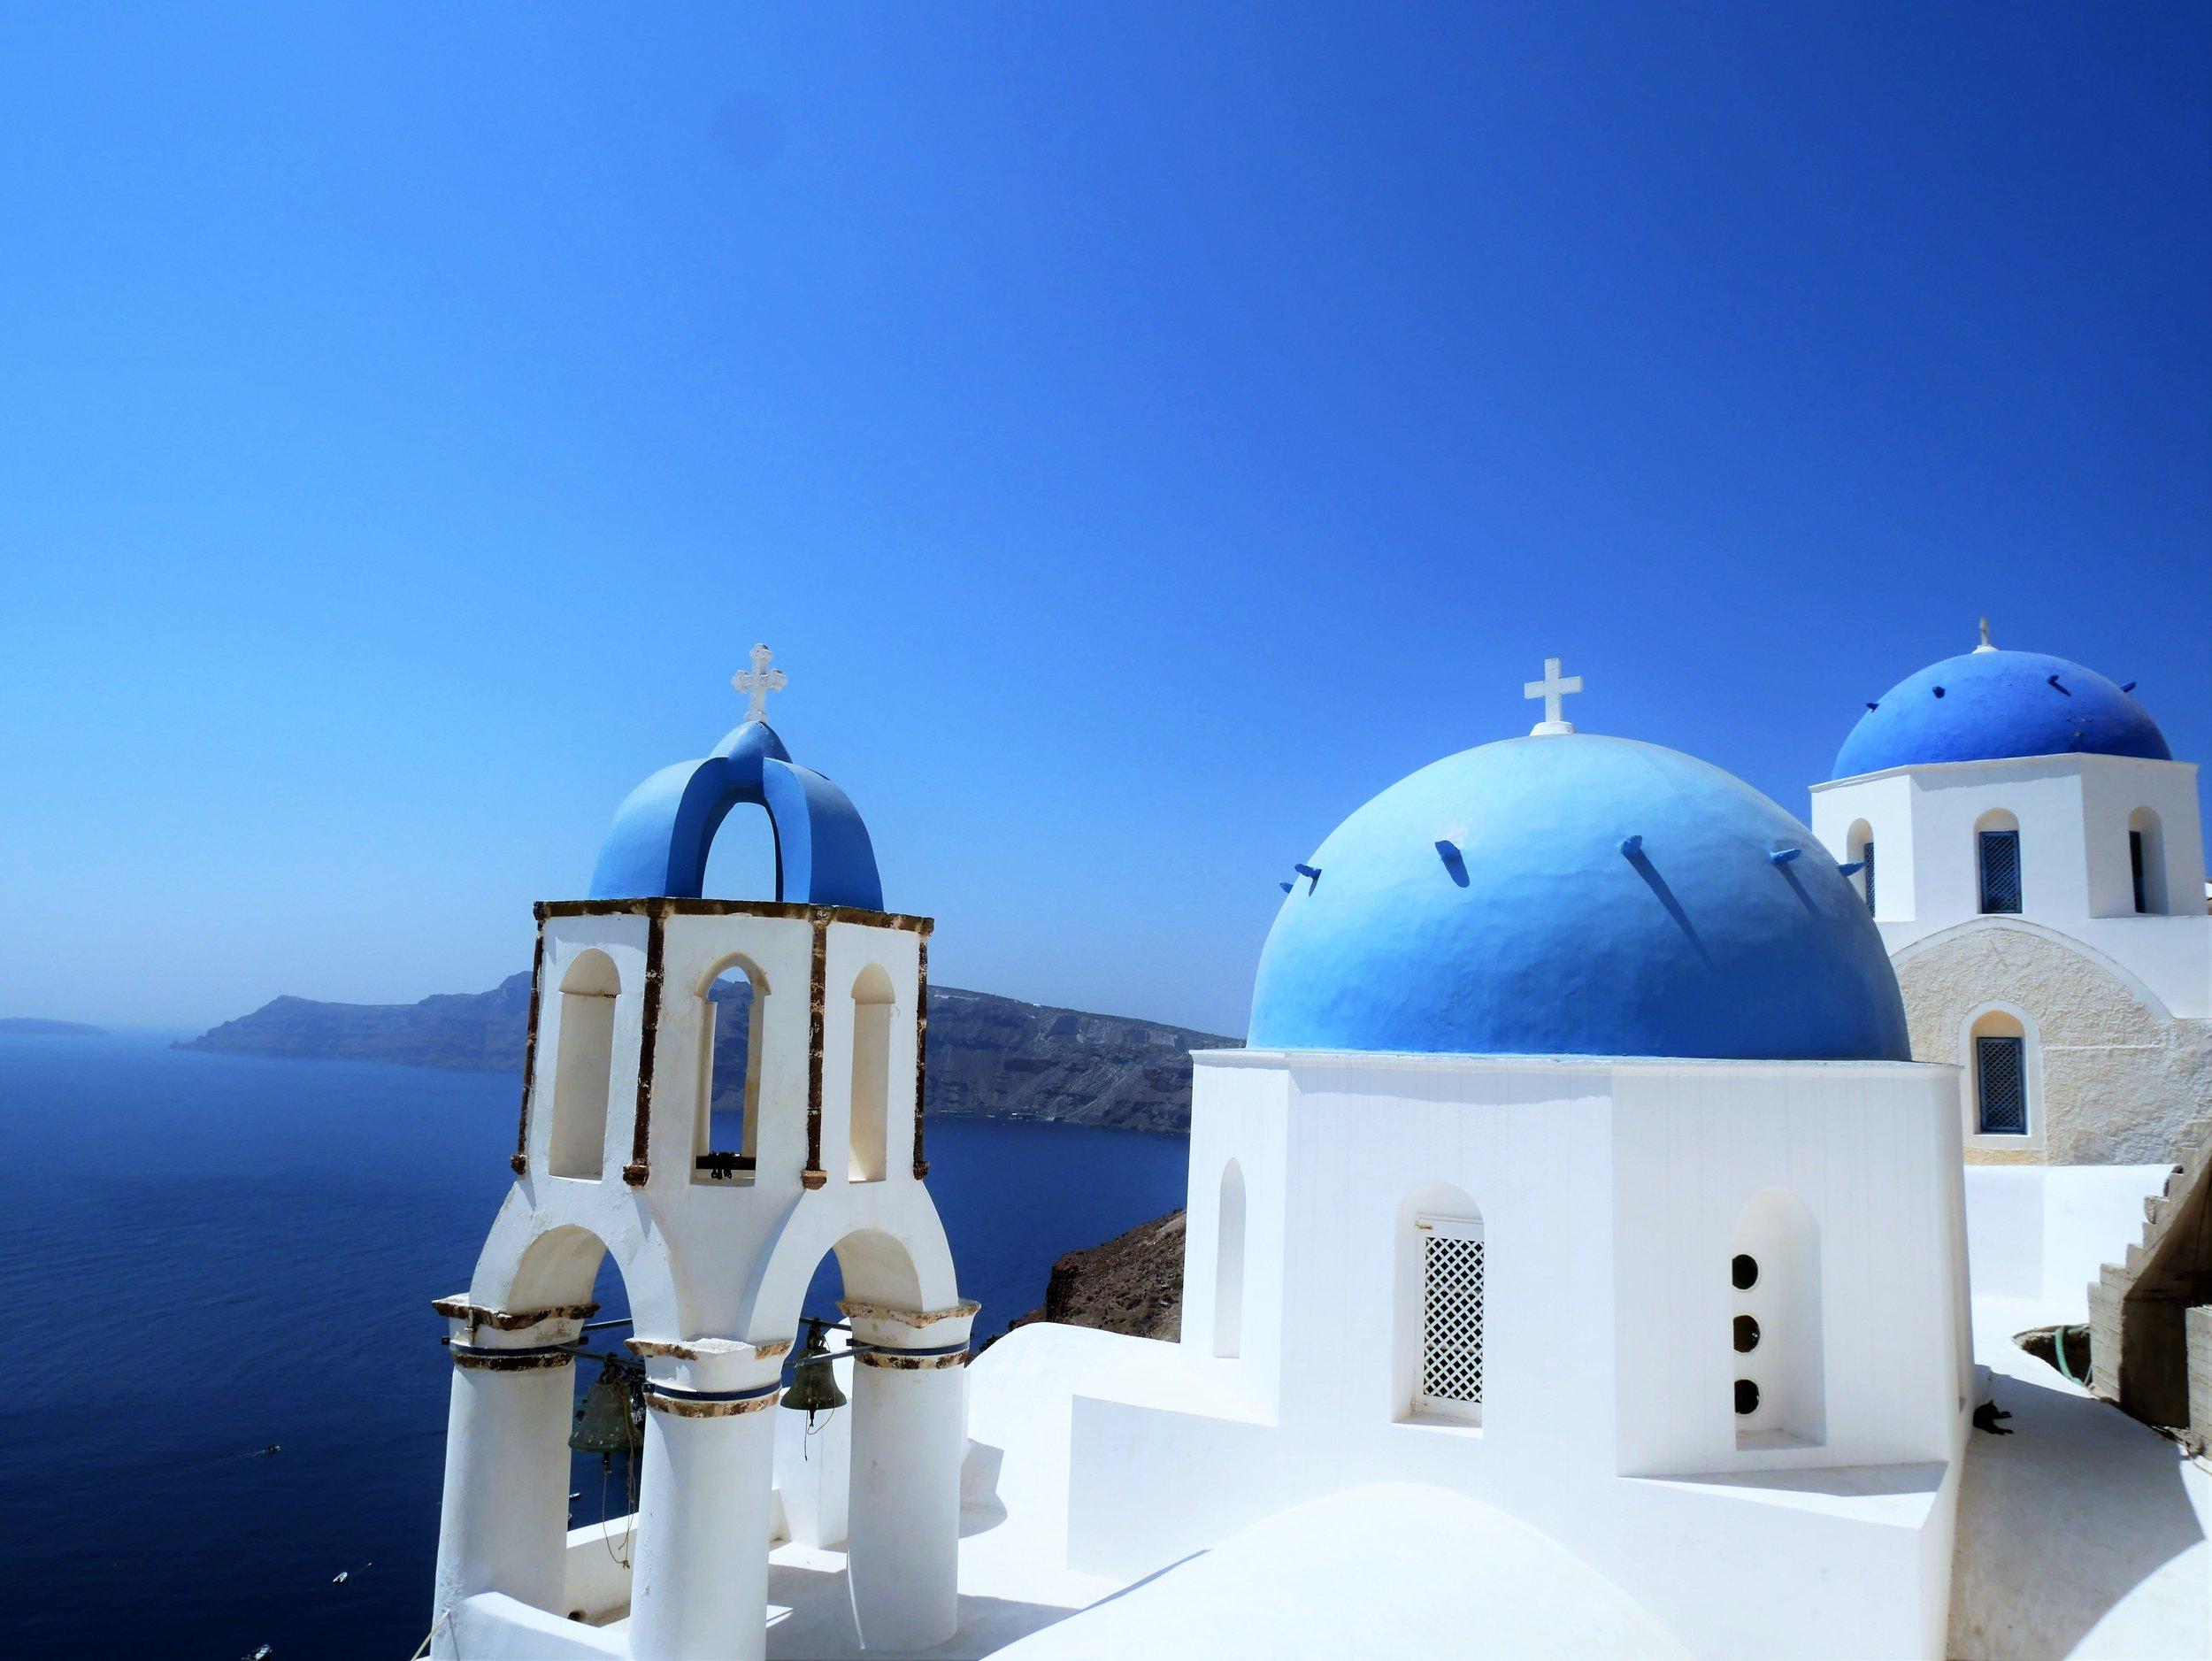 The blue dome churches in Santorini are heavenly.